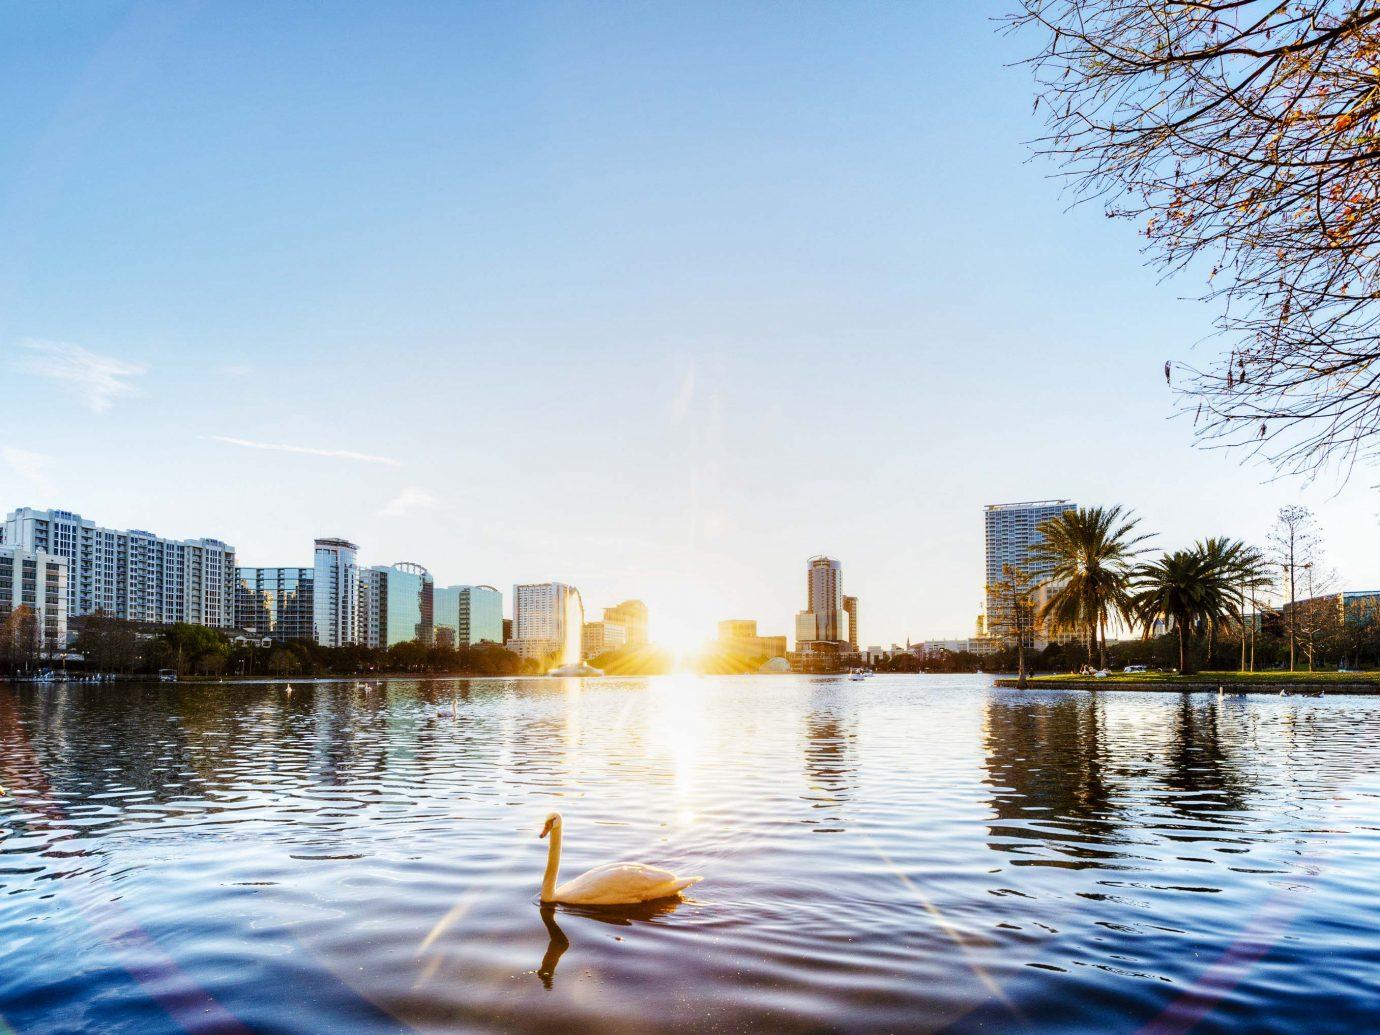 Orlando view on Lake Eola